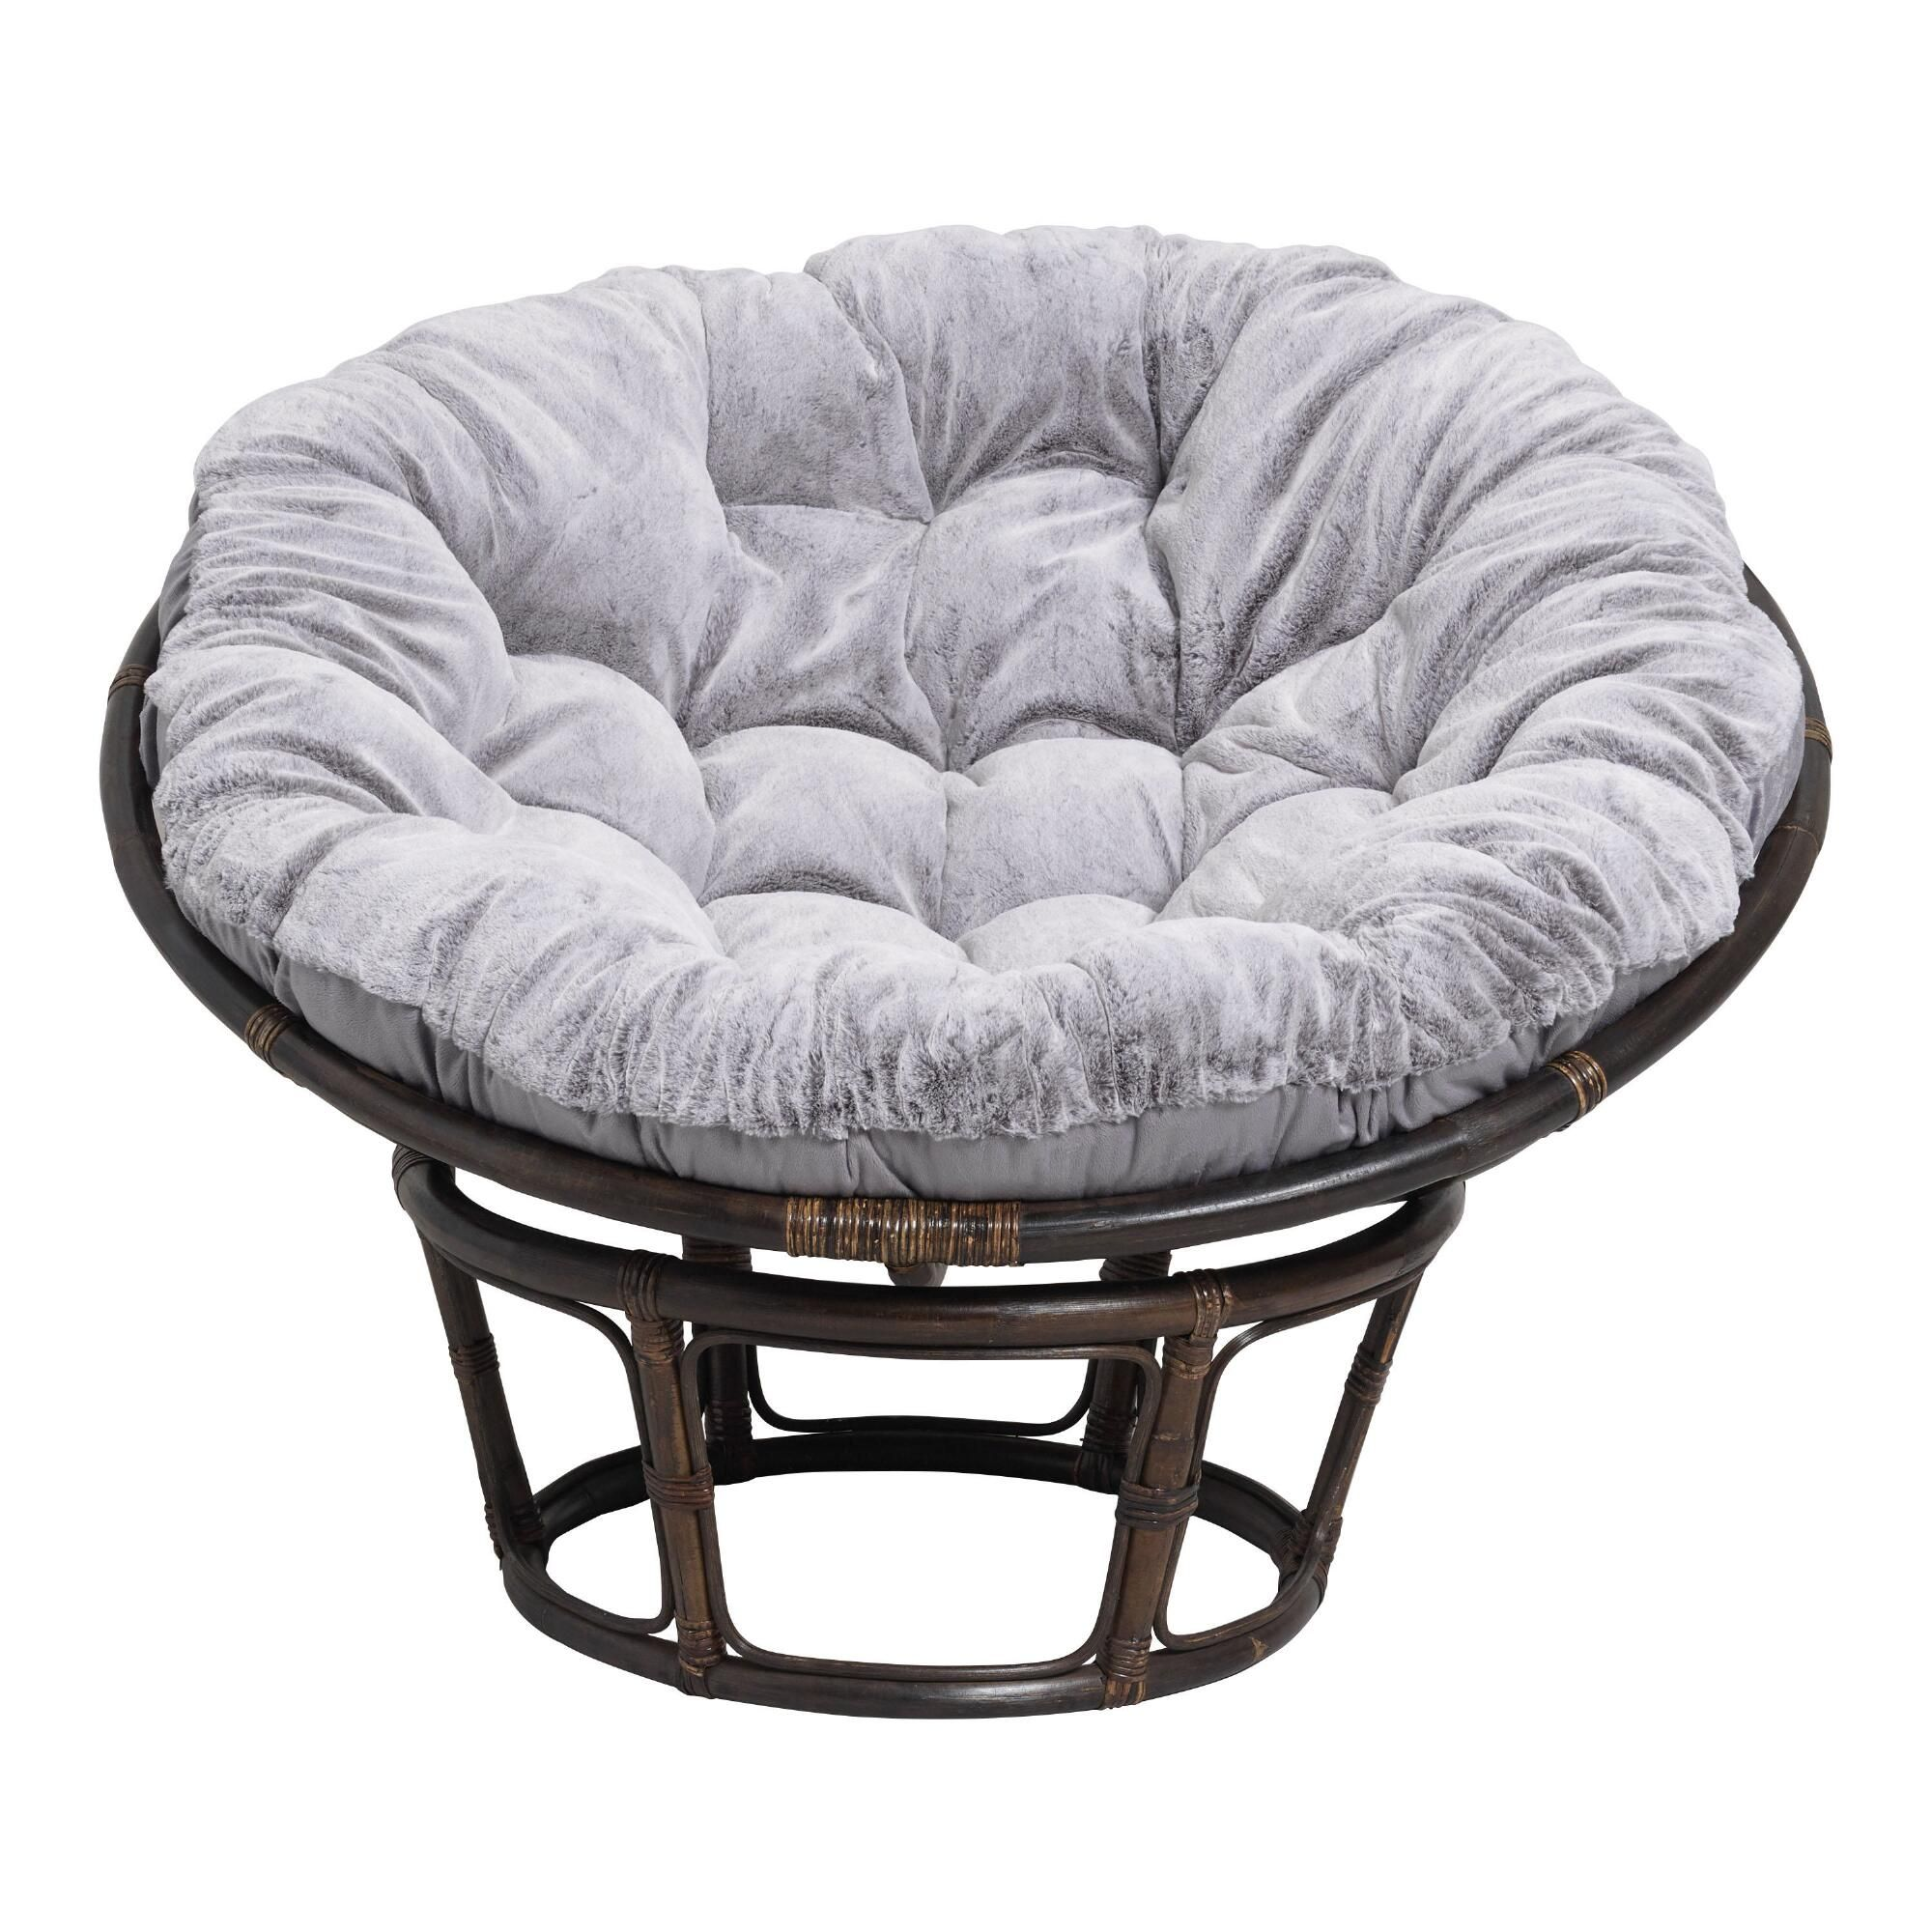 Gray Faux Fur Papasan Chair Cushion Papasan Chair Papasan Chair Cushion